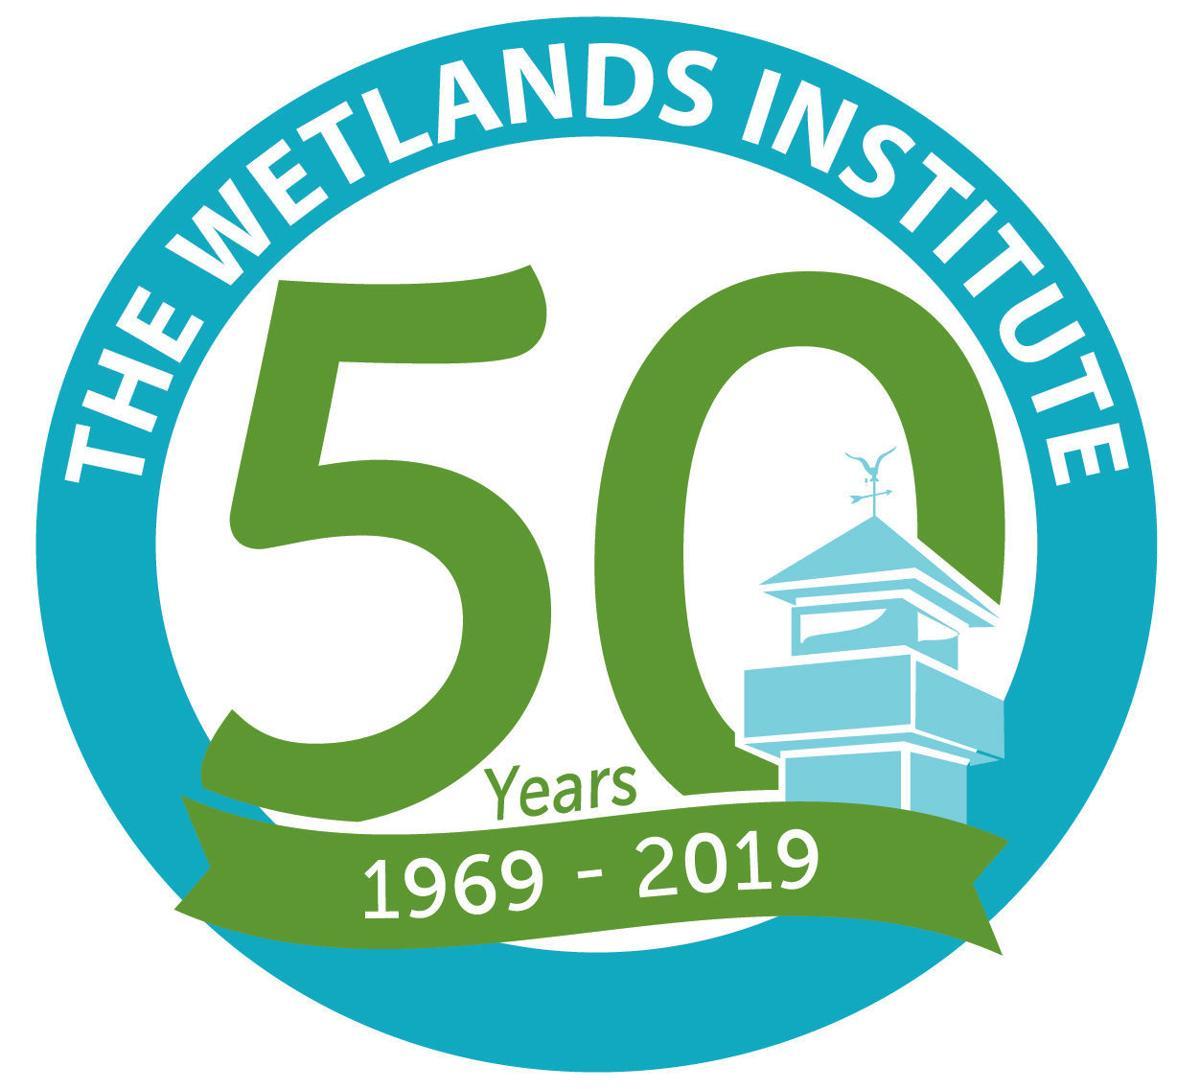 d9b9e5ff65ed Wetlands Institute celebrates 50 years of research